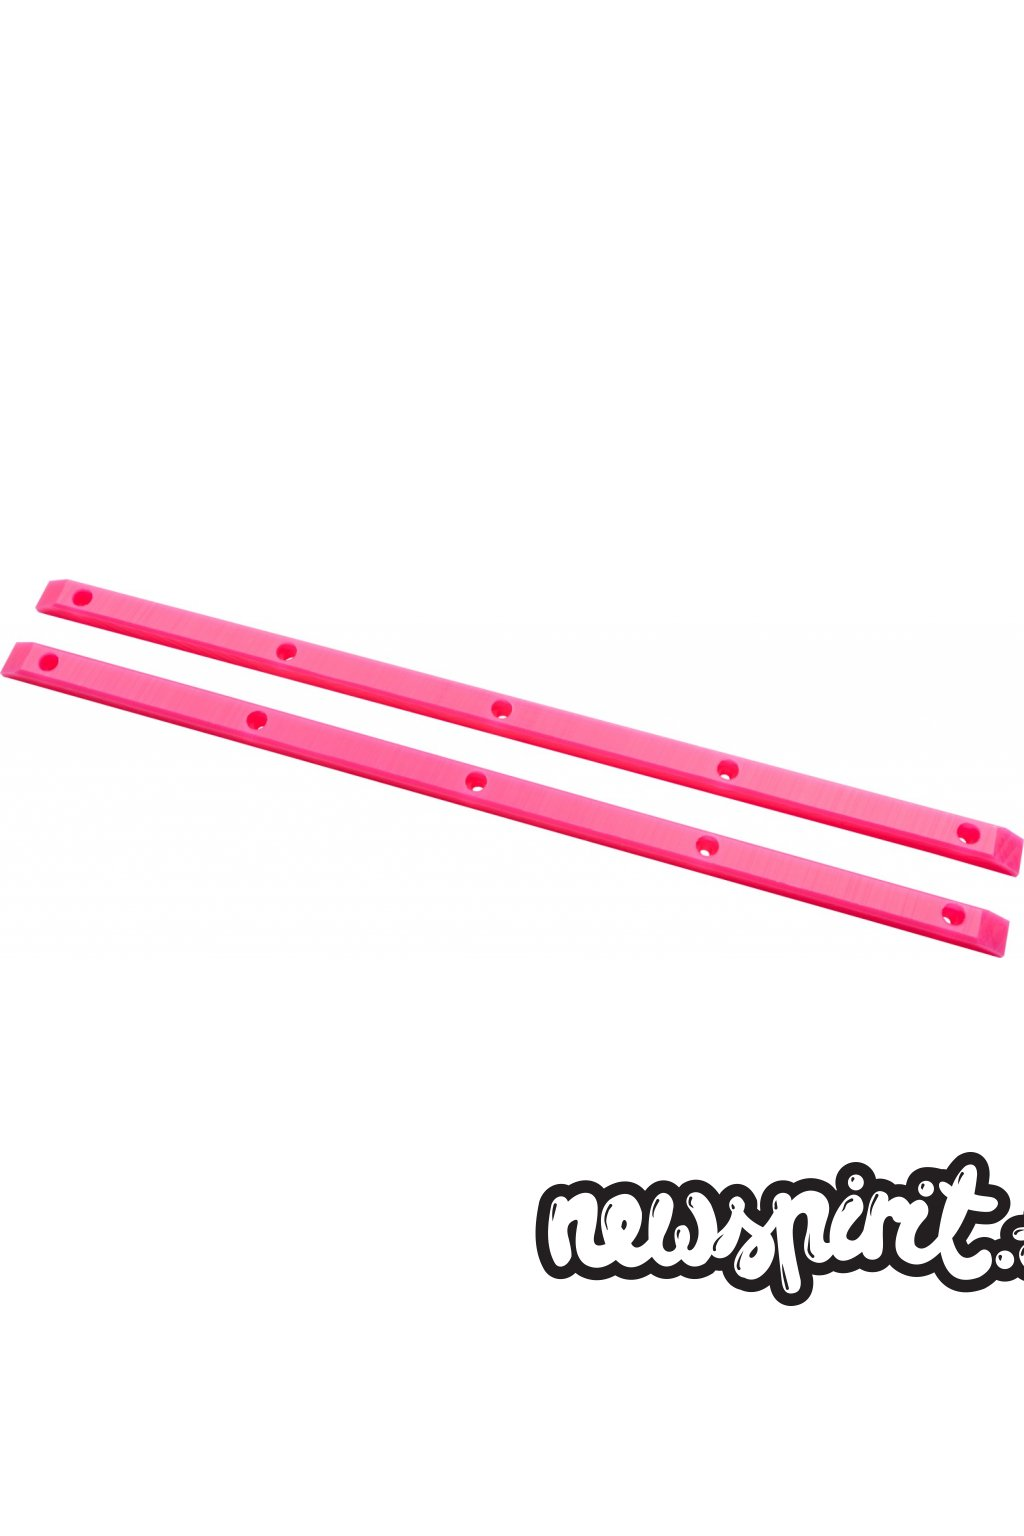 "Powell Peralta Rib Bones Rails Pink 14,5"""